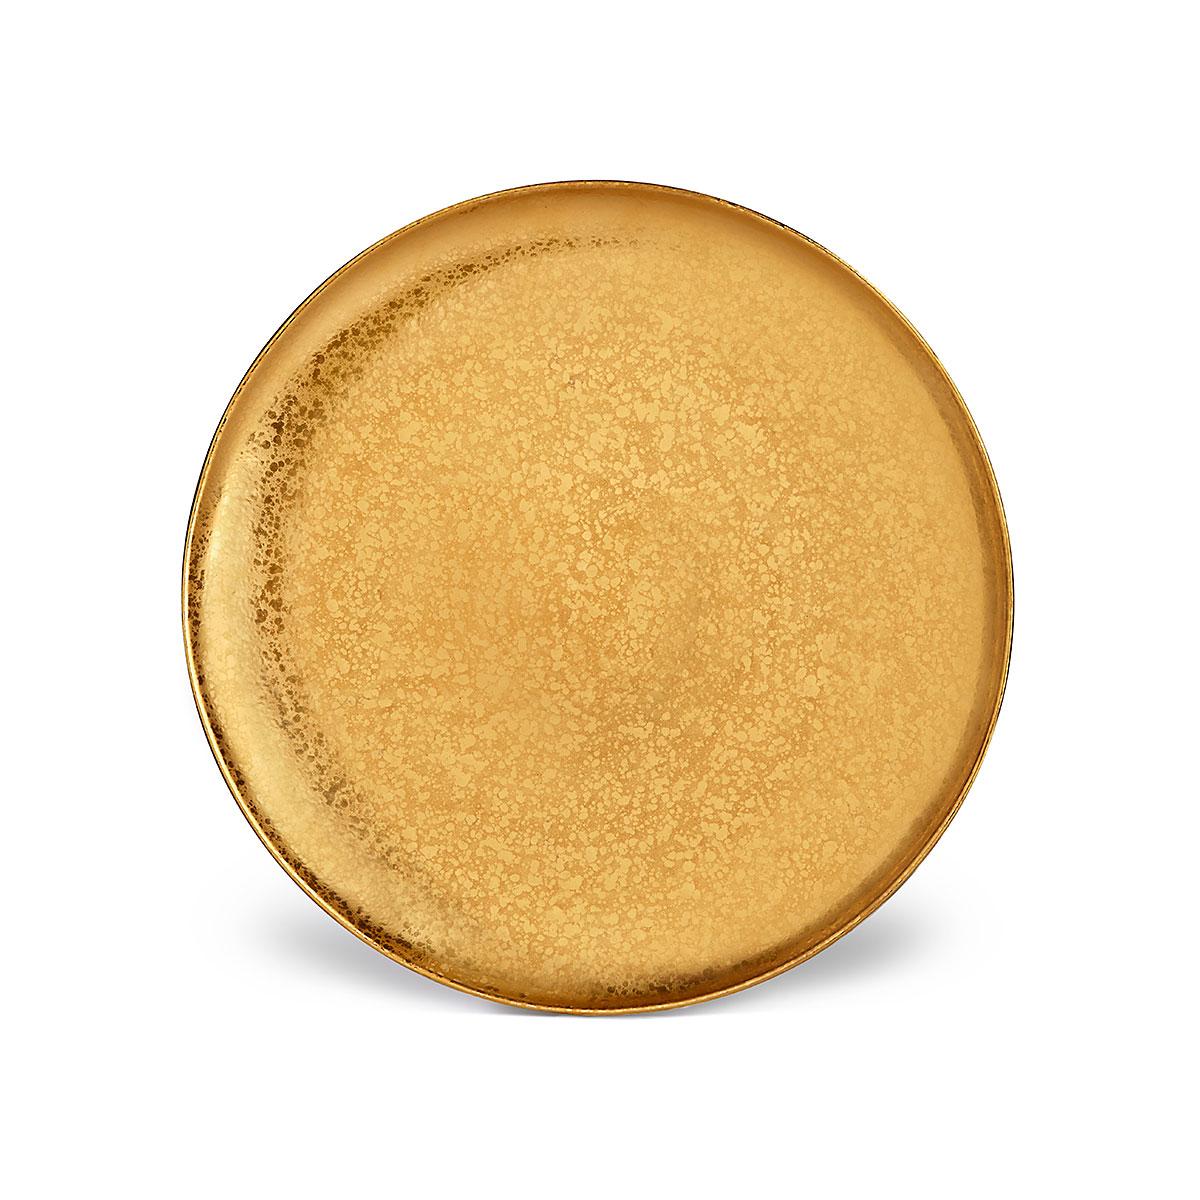 L'Objet I Alchimie Charger Gold